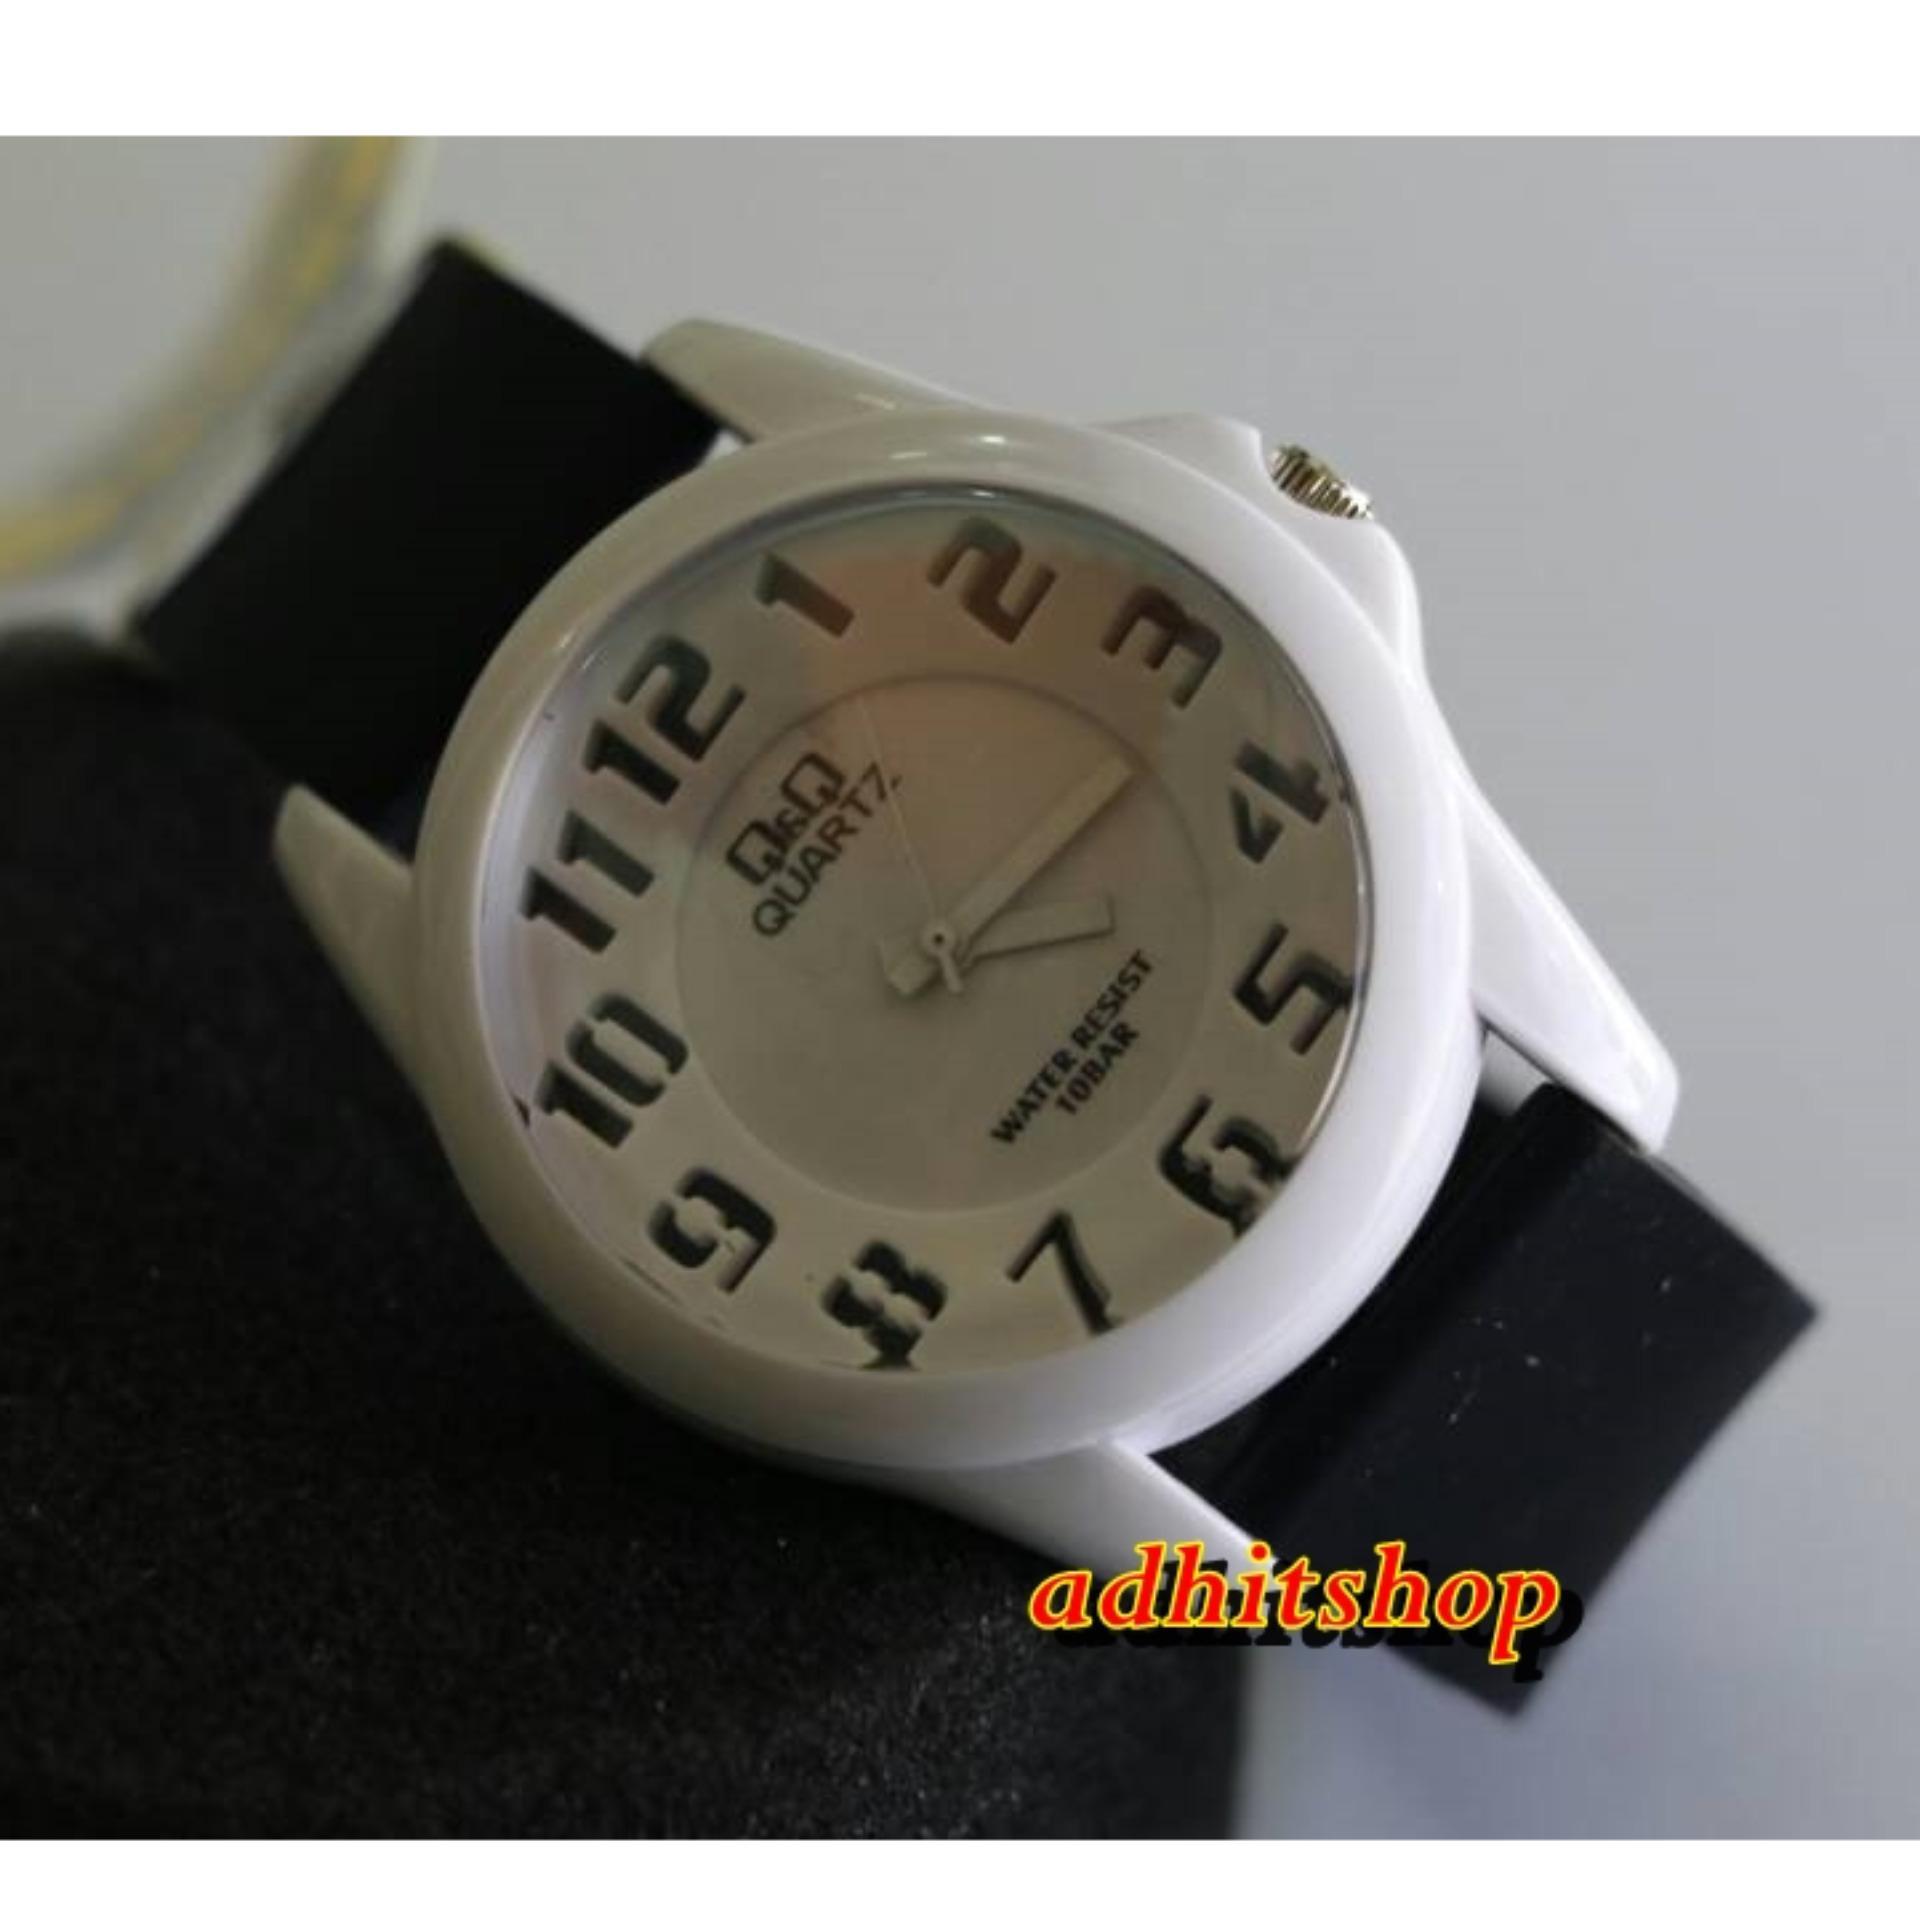 Q&Q Watch - QQ018 - Jam Tangan Sport Wanita - Rubber Strap - Black White .